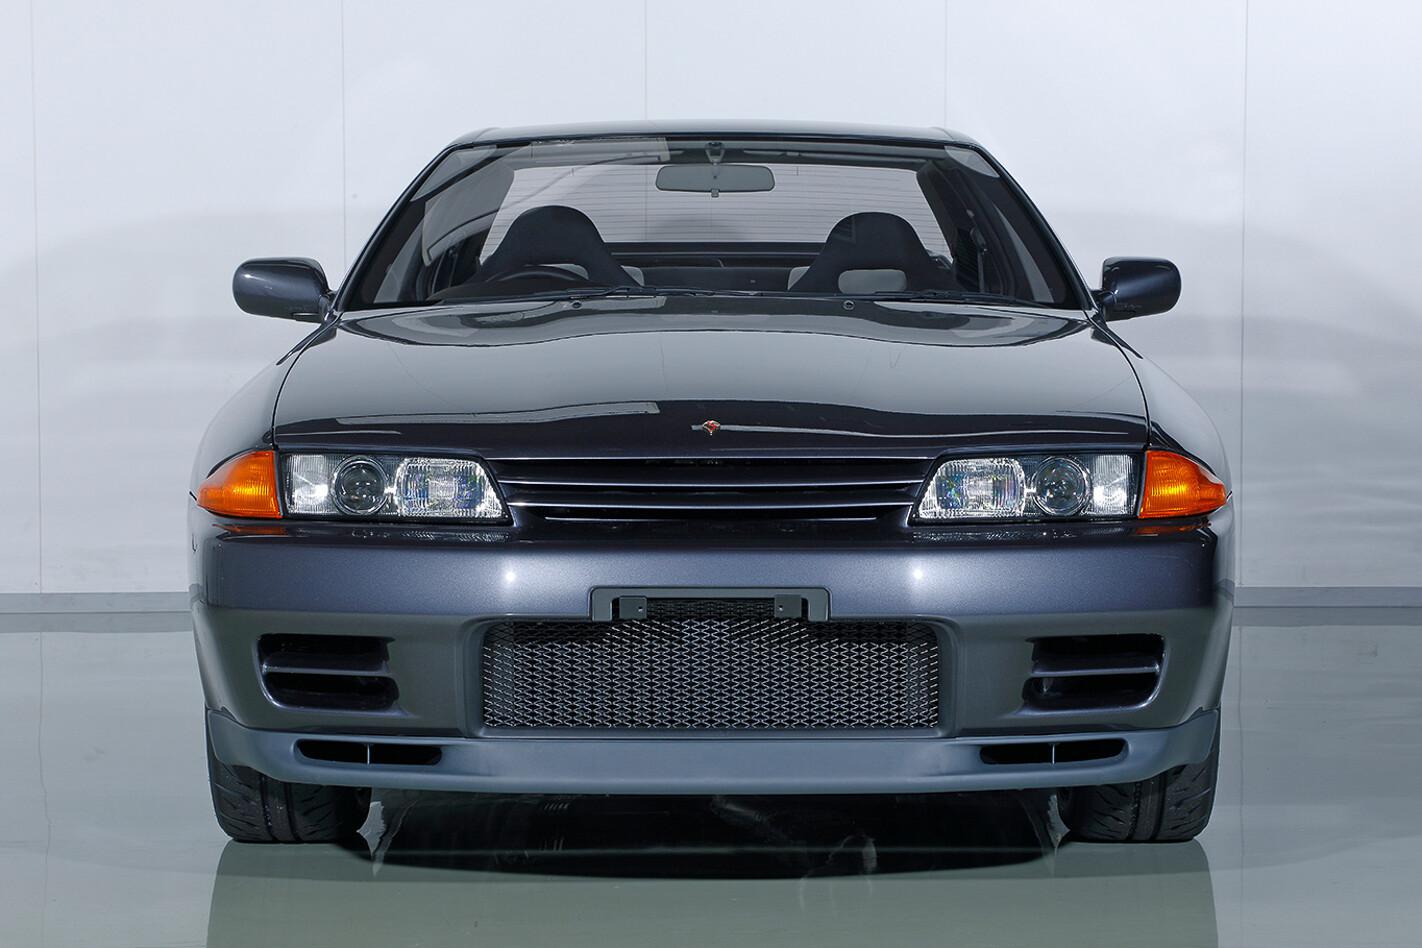 Nissan Skyline GTR R 32 NISMO Restored Car 04 A Jpg